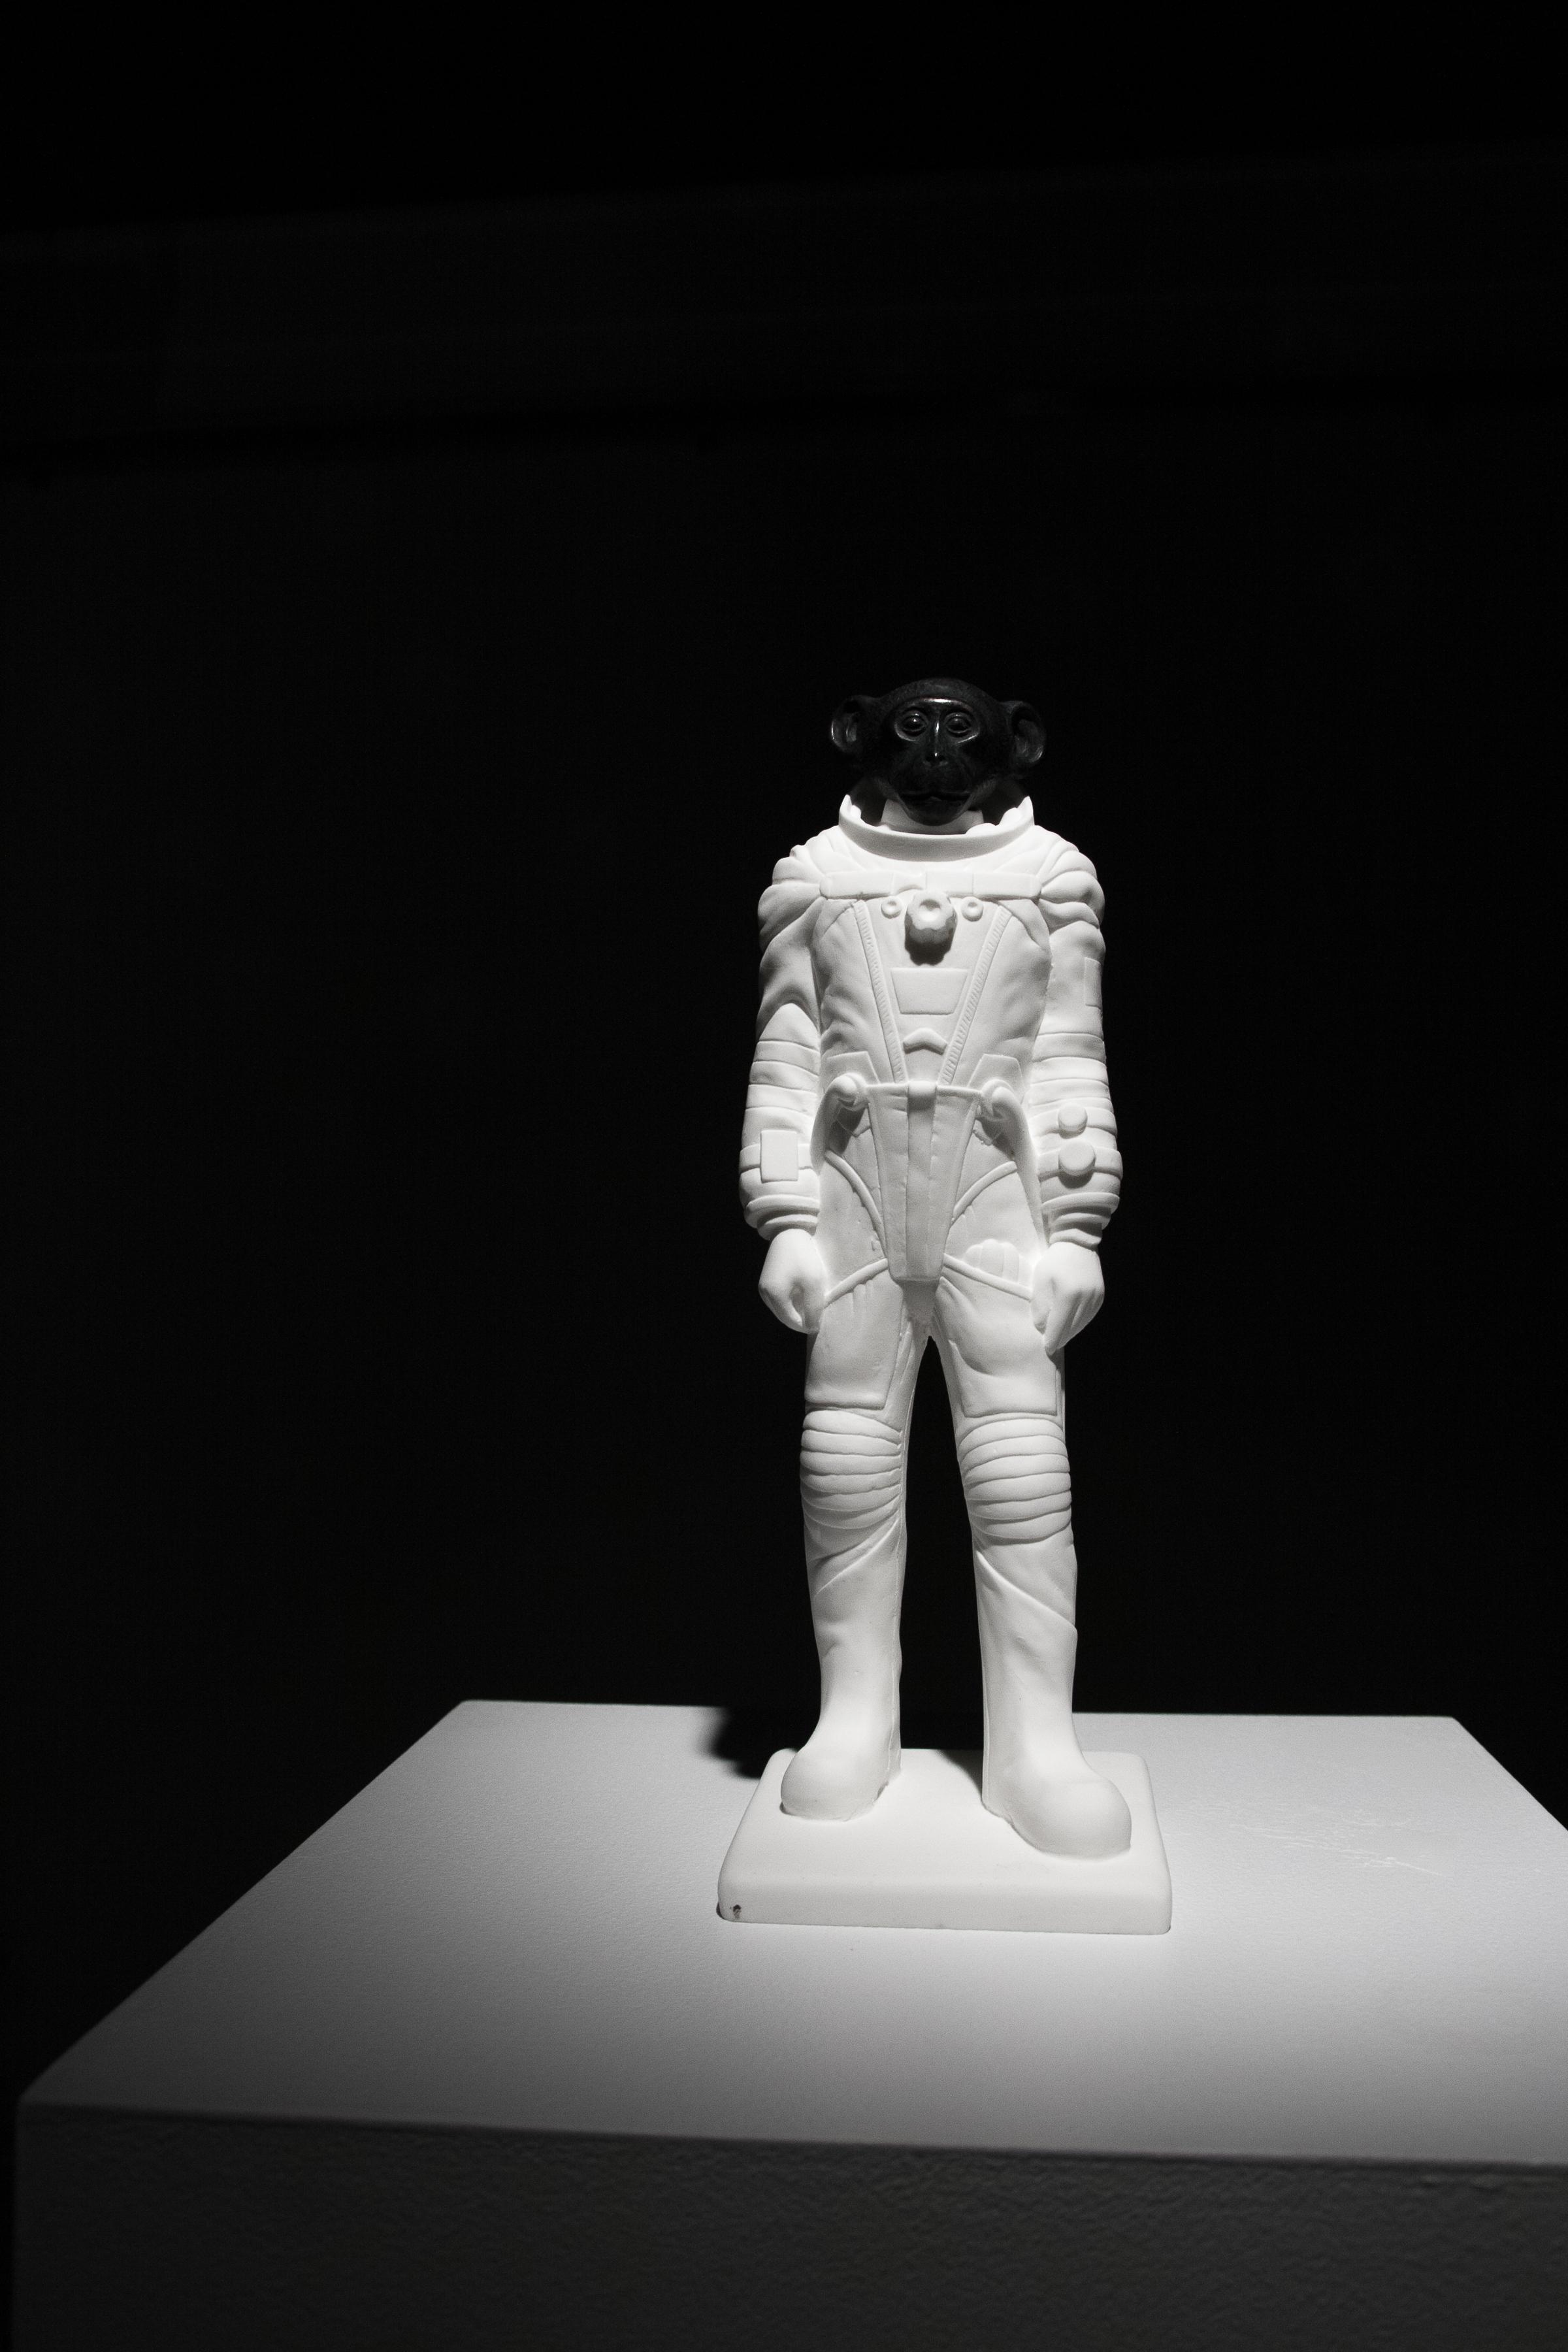 astronaut, Astronomy, Cosmonaut, Cosmos, Exploration, HQ Photo